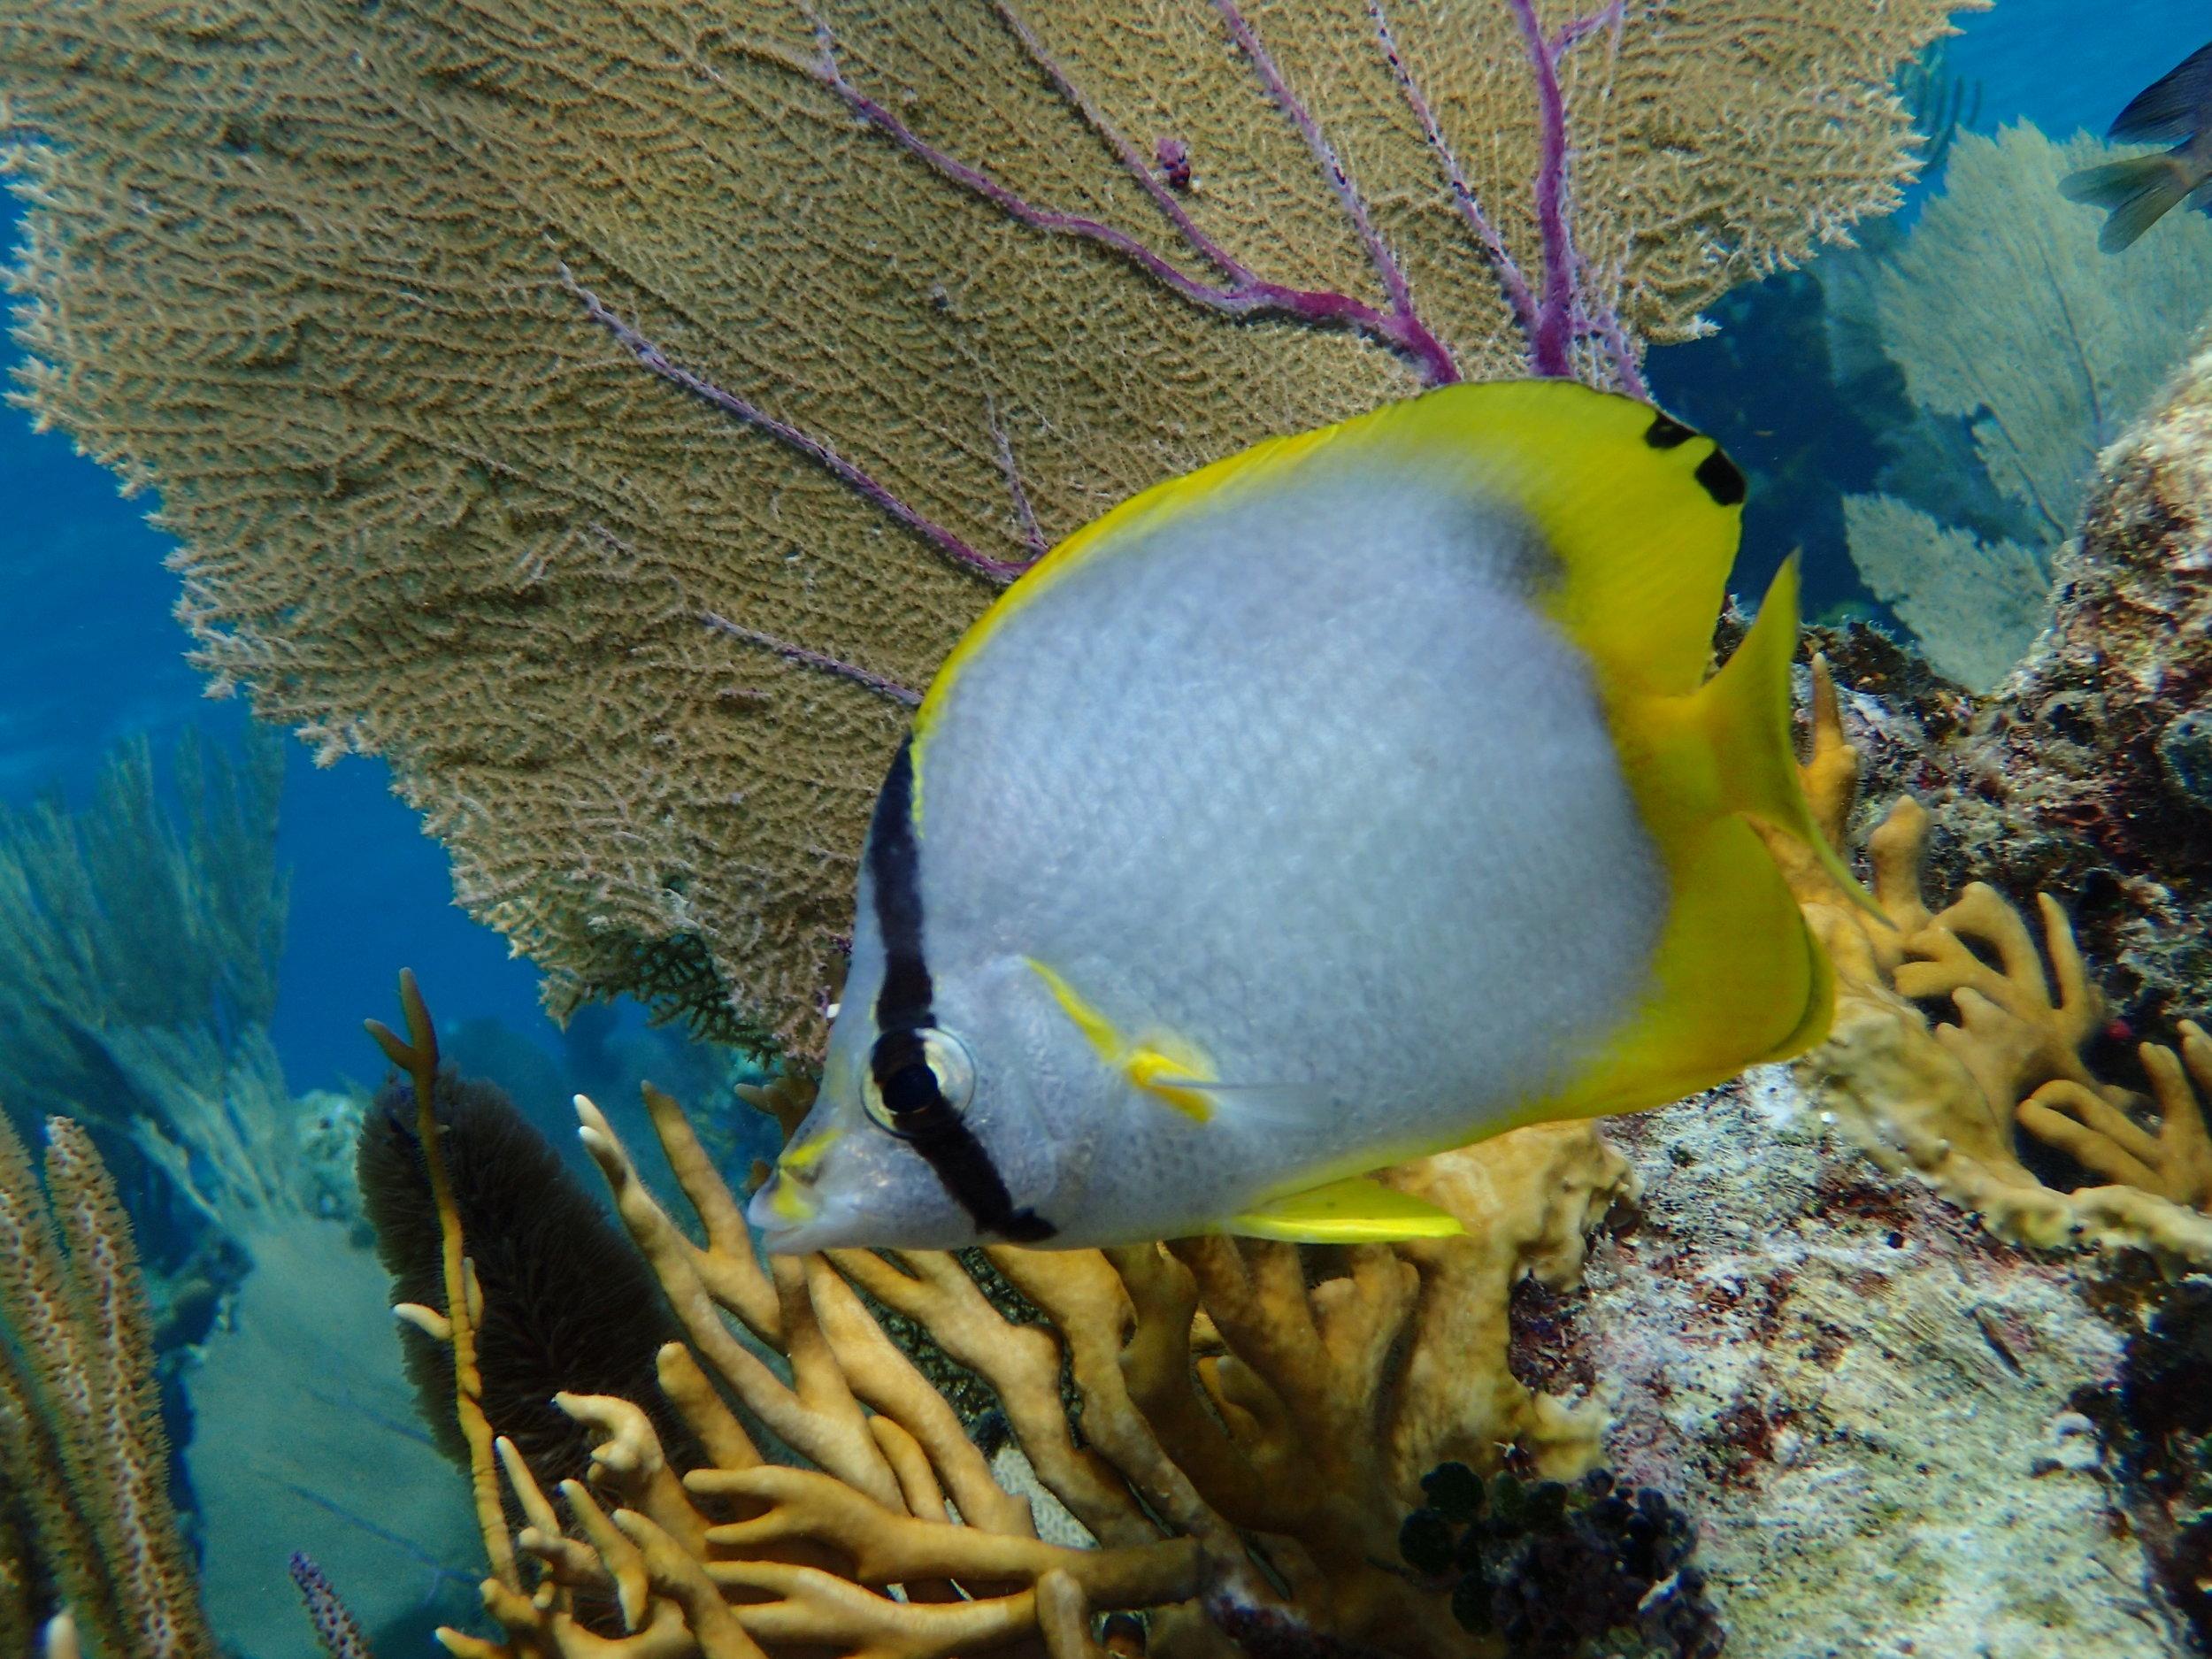 Turneffe Flats Belize Snorkeling